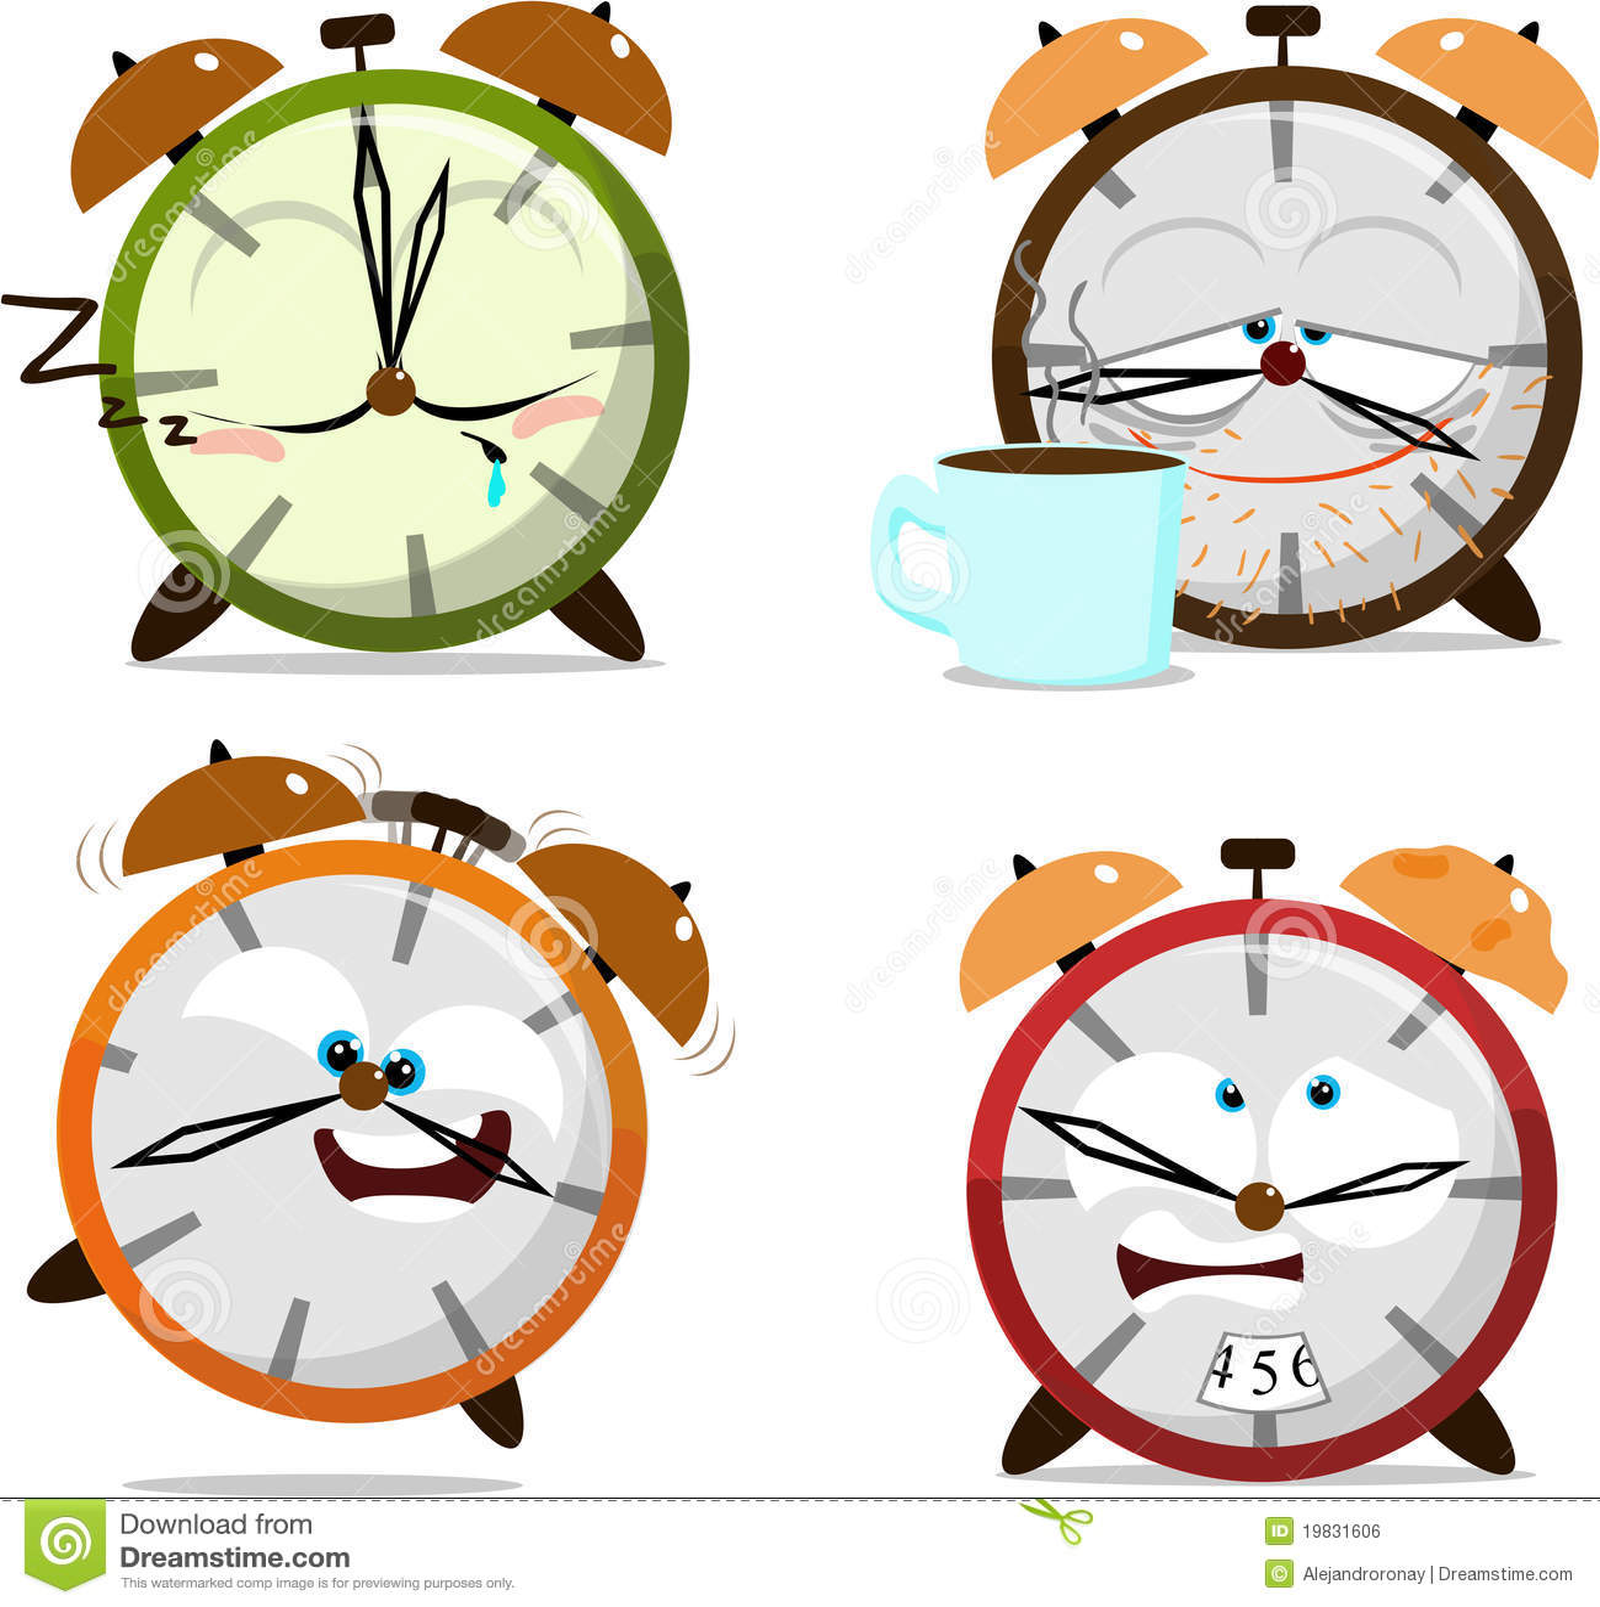 Cute Cartoon Clocks Royalty Free Stock Image Image 19831606